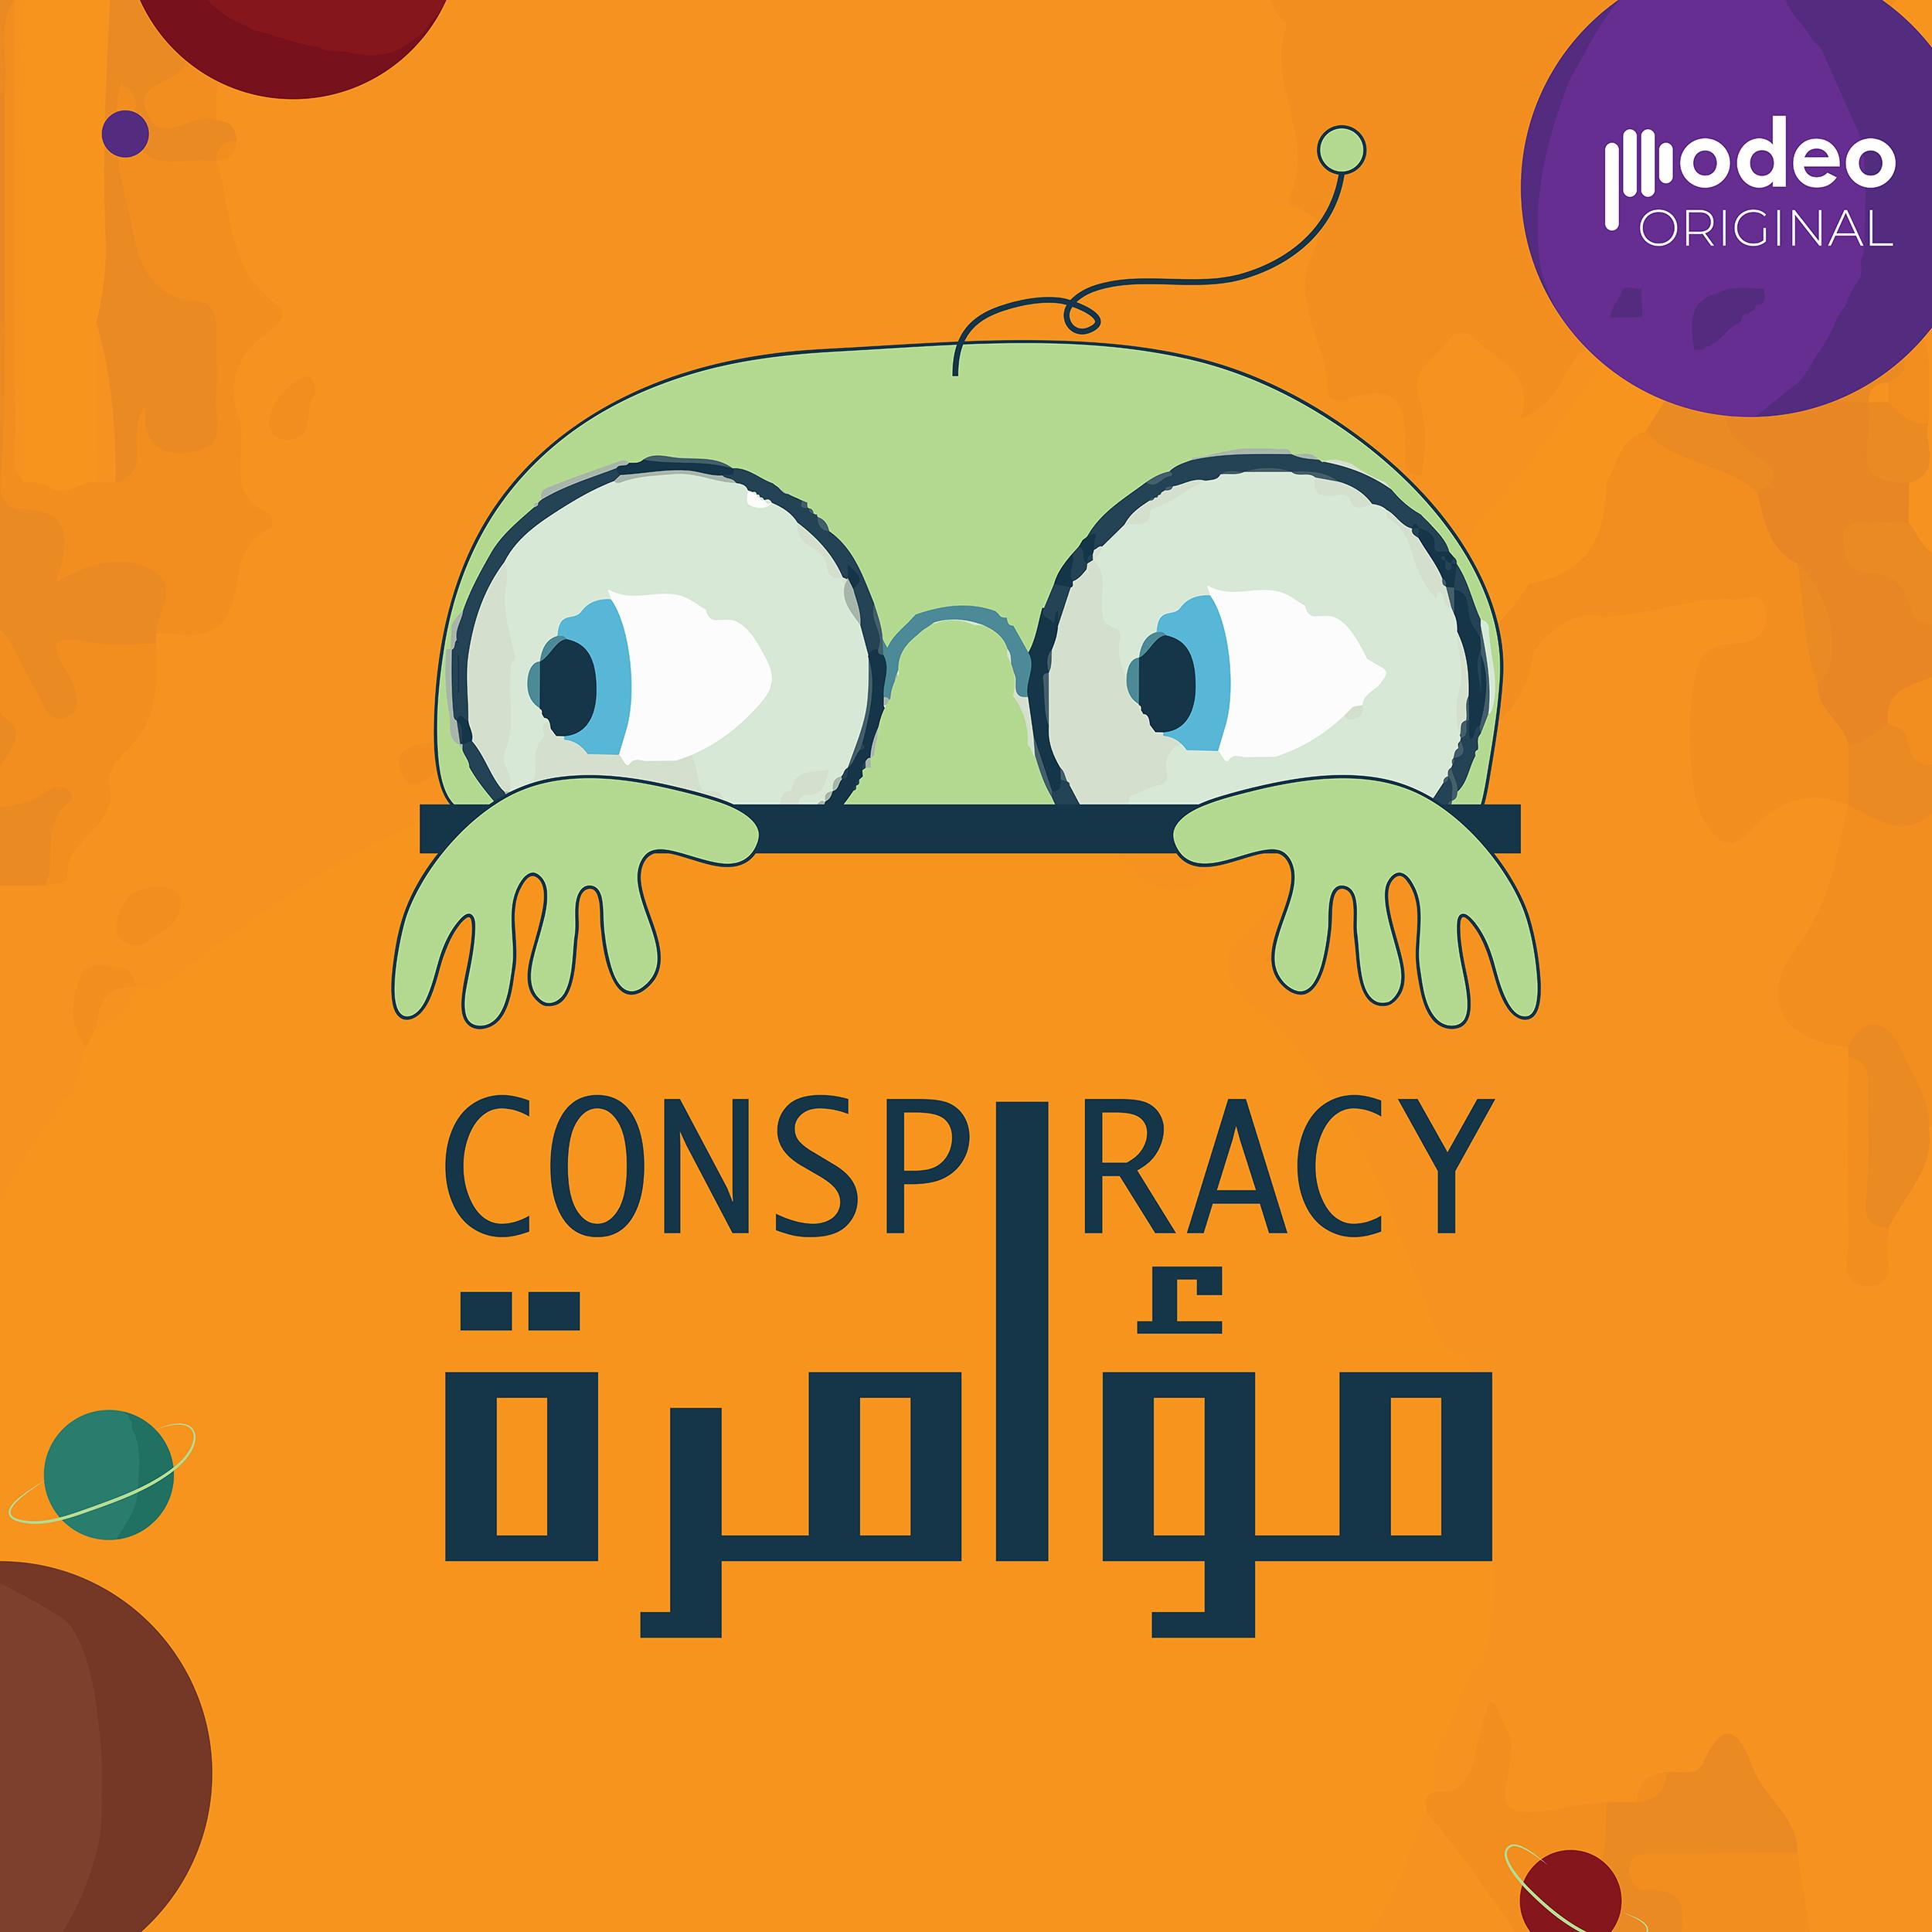 Conspiracy | مؤامرة